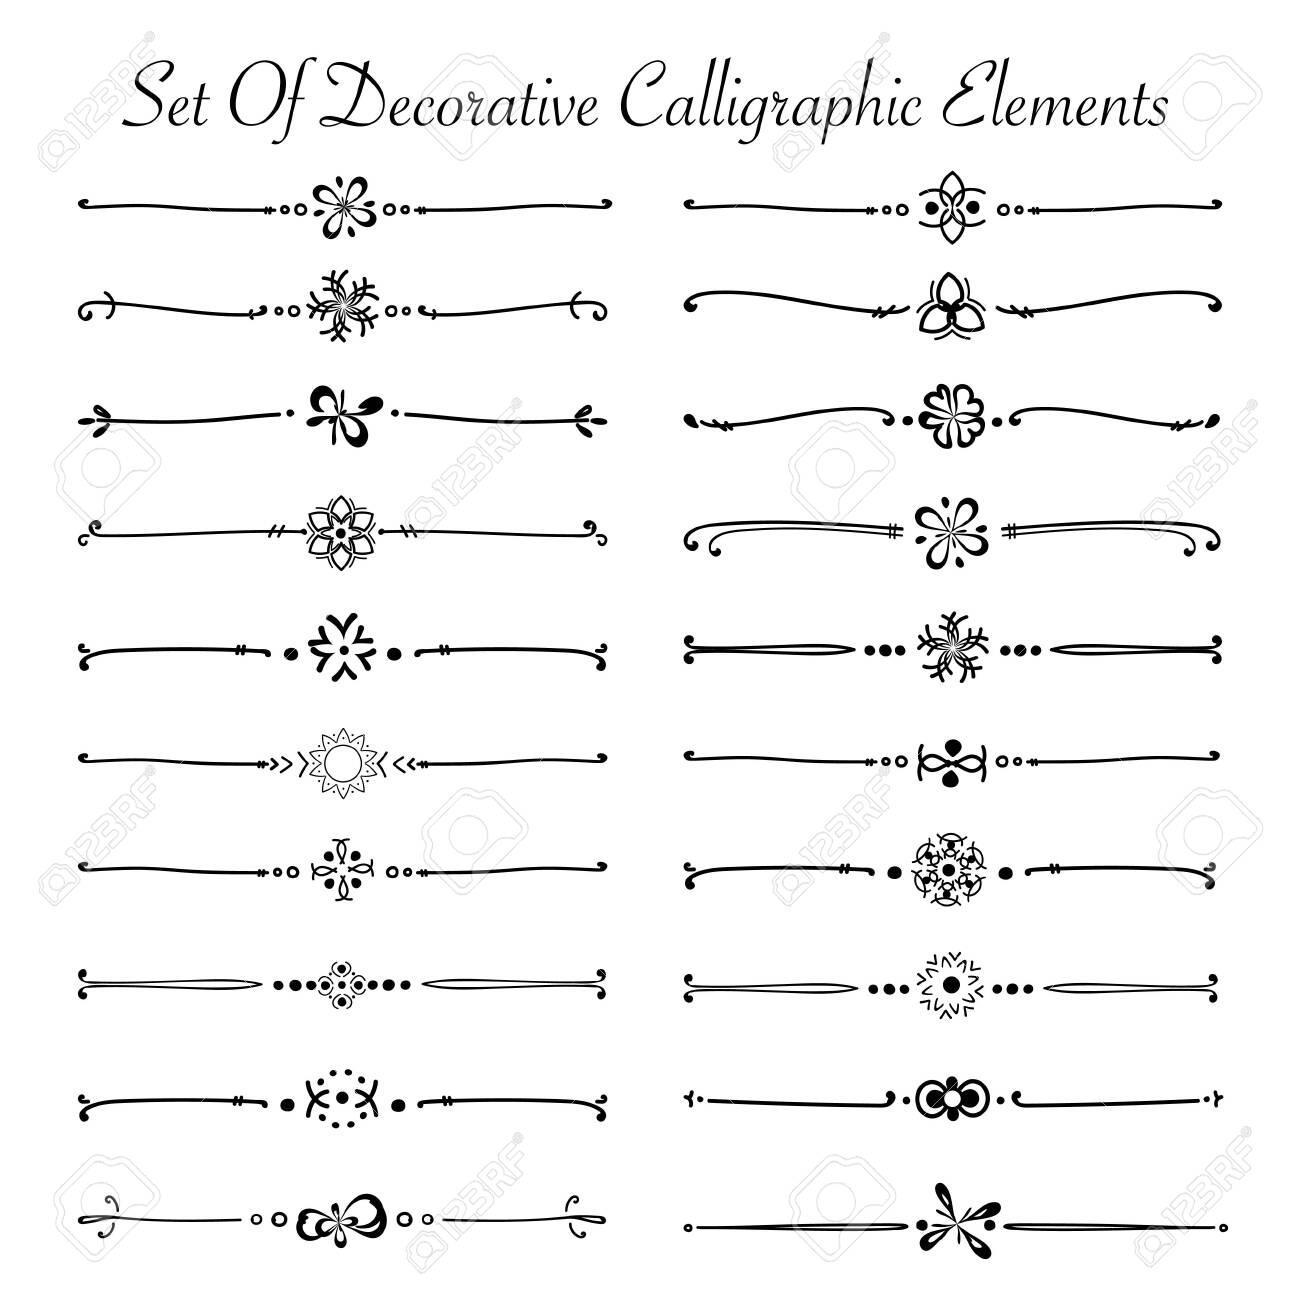 Set Of Decorative Calligraphic Elements For Decoration. Handmade Vector Illustration. - 138645518